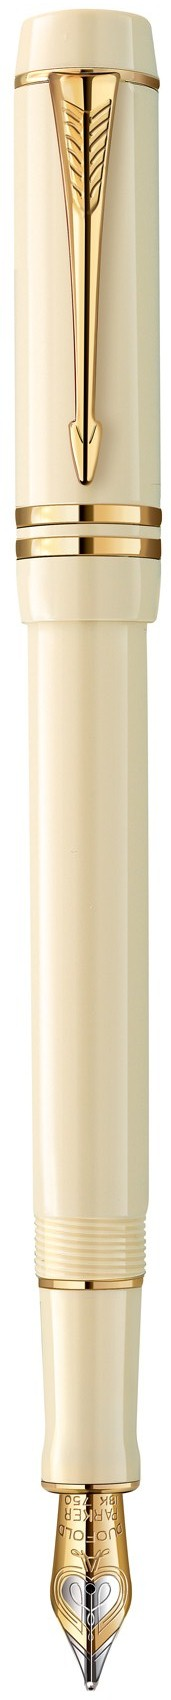 Bút máy Parker Duofold 14 International Ivory cài vàng